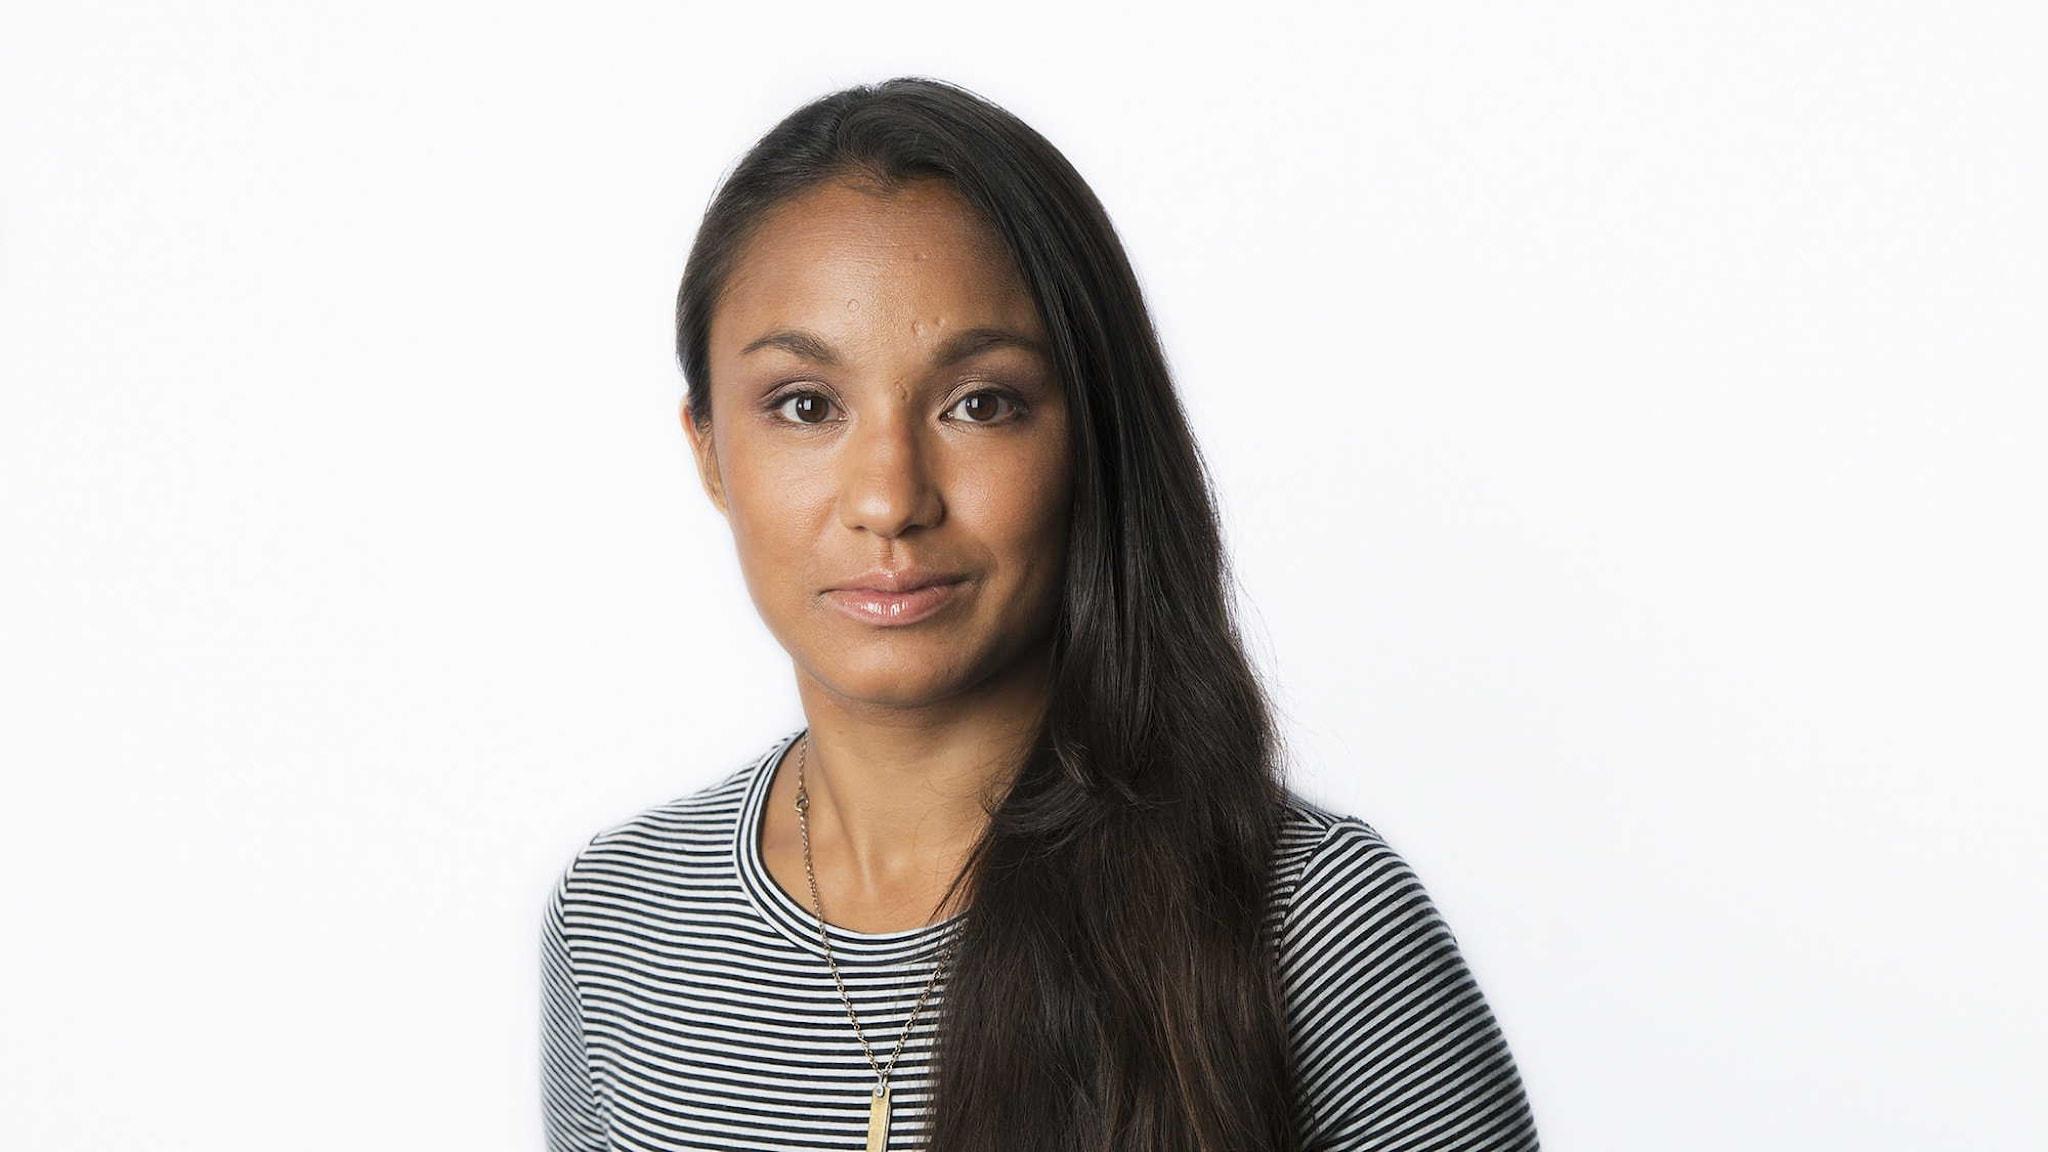 Paloma Vangpreecha. Foto: Mattias Ahlm/Sveriges Radio.